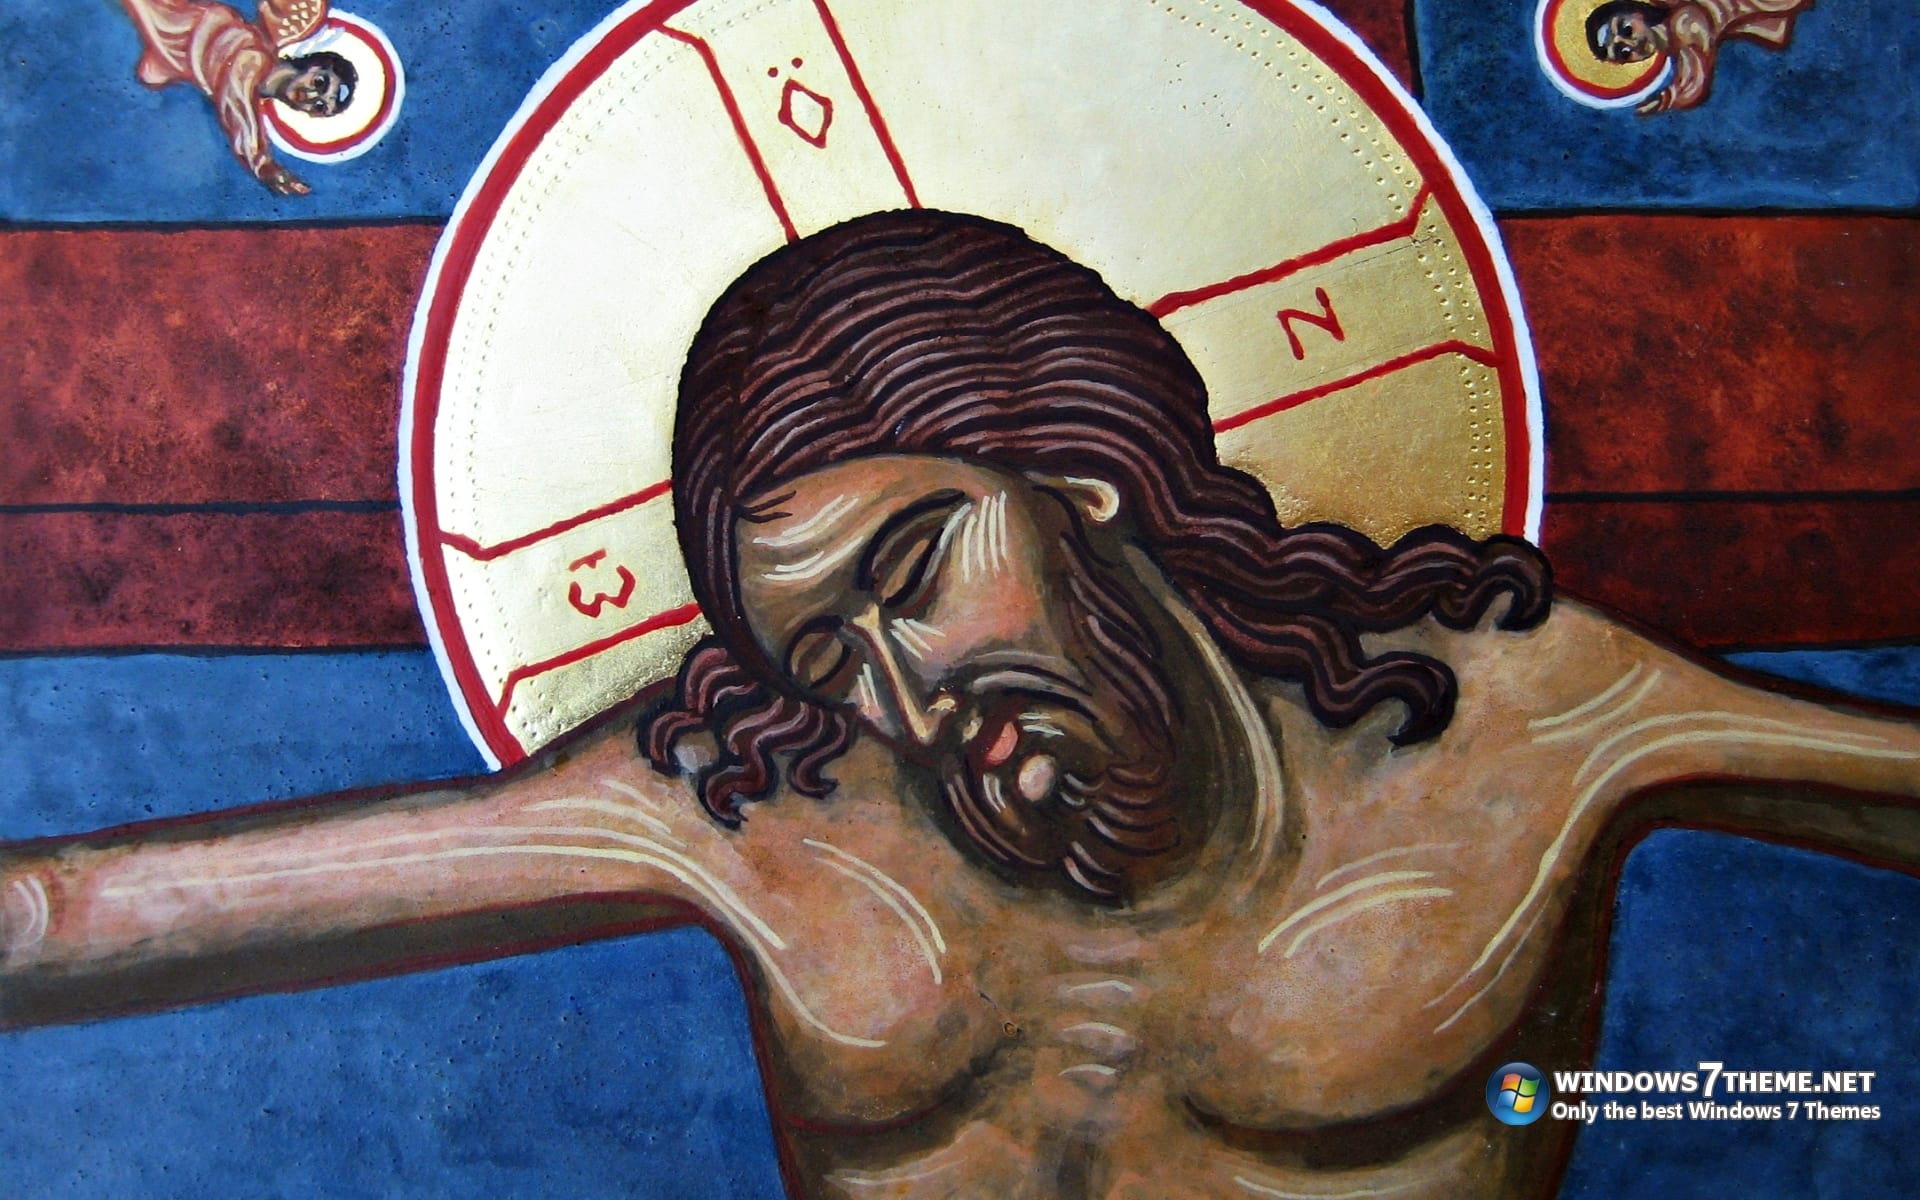 Jesus Christ Windows 7 Theme